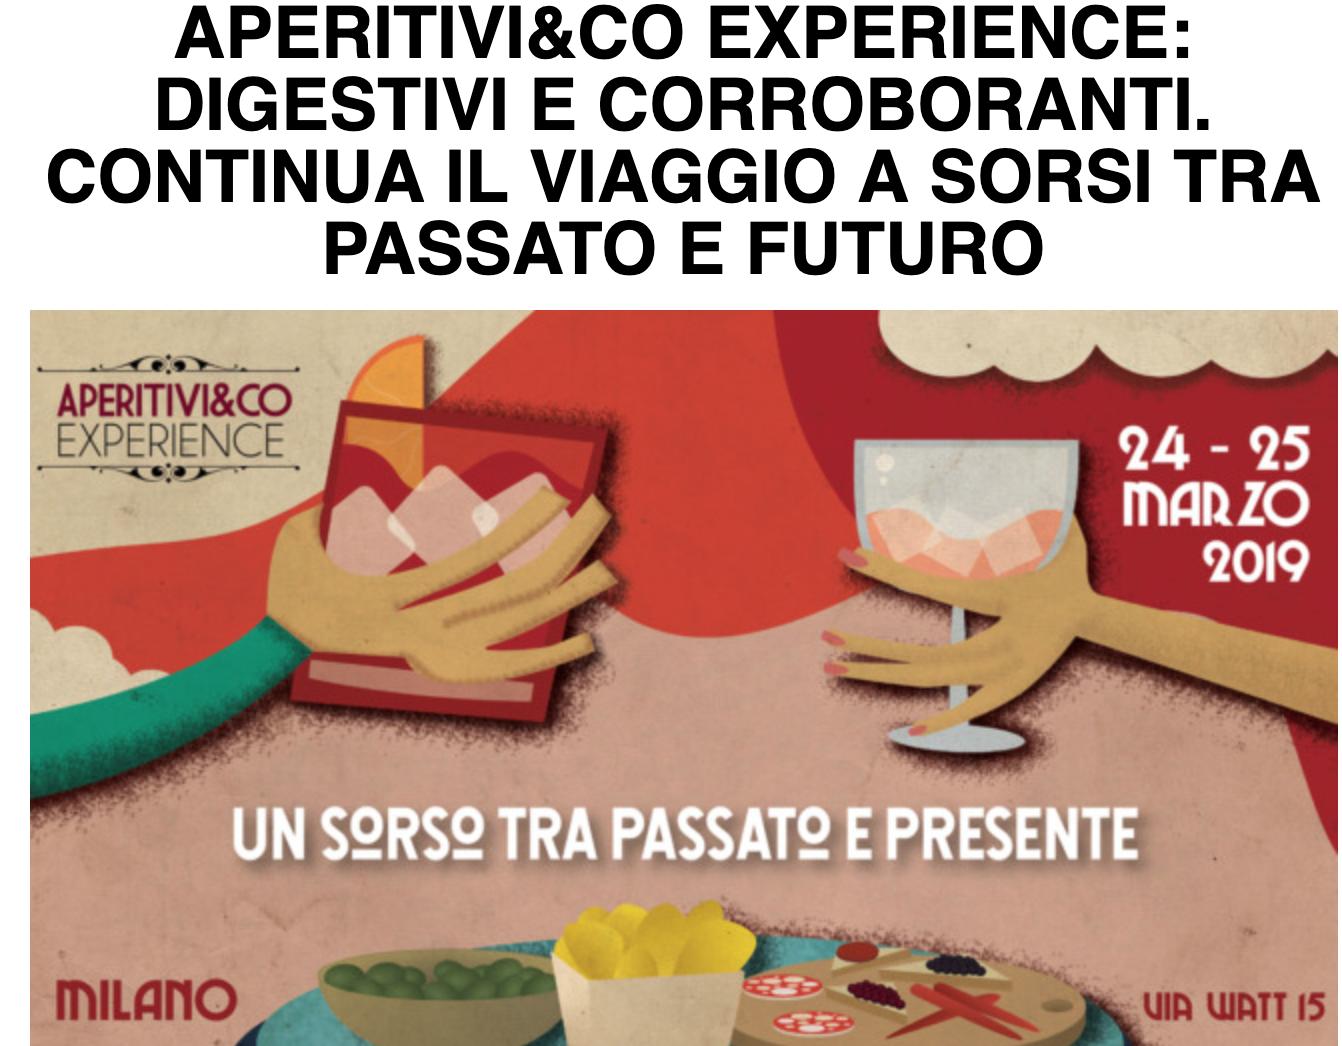 Beverfood.com -